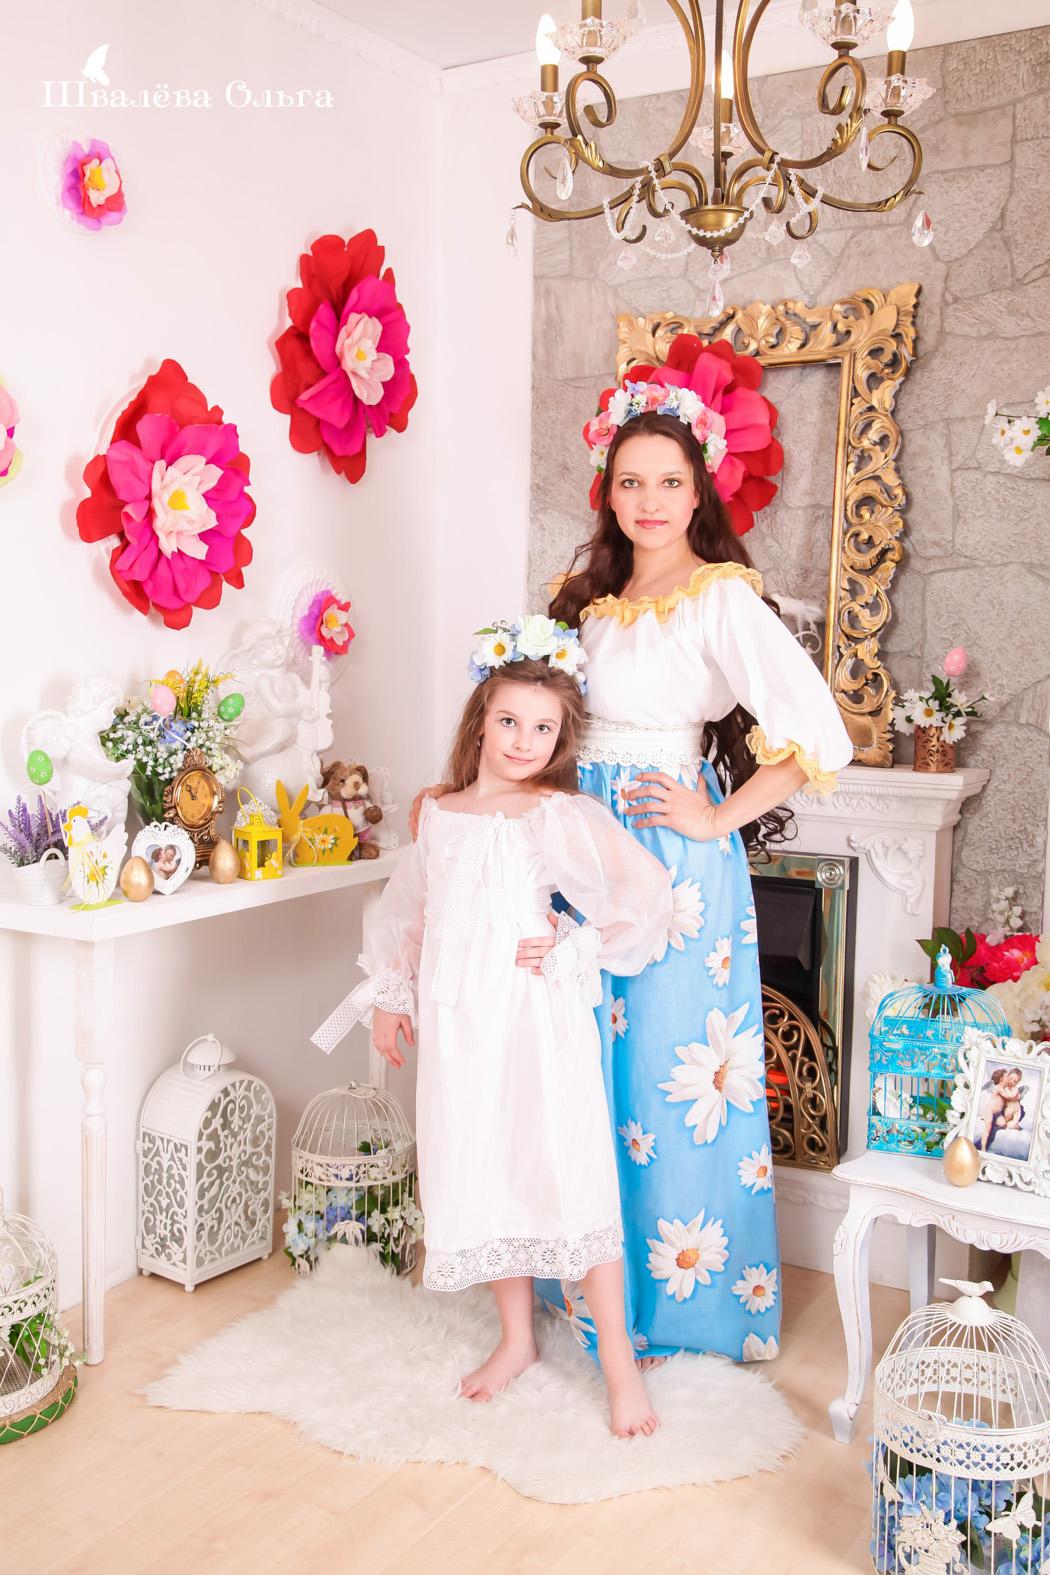 Фотостудия АБРИС г Томск тел 33-11-27